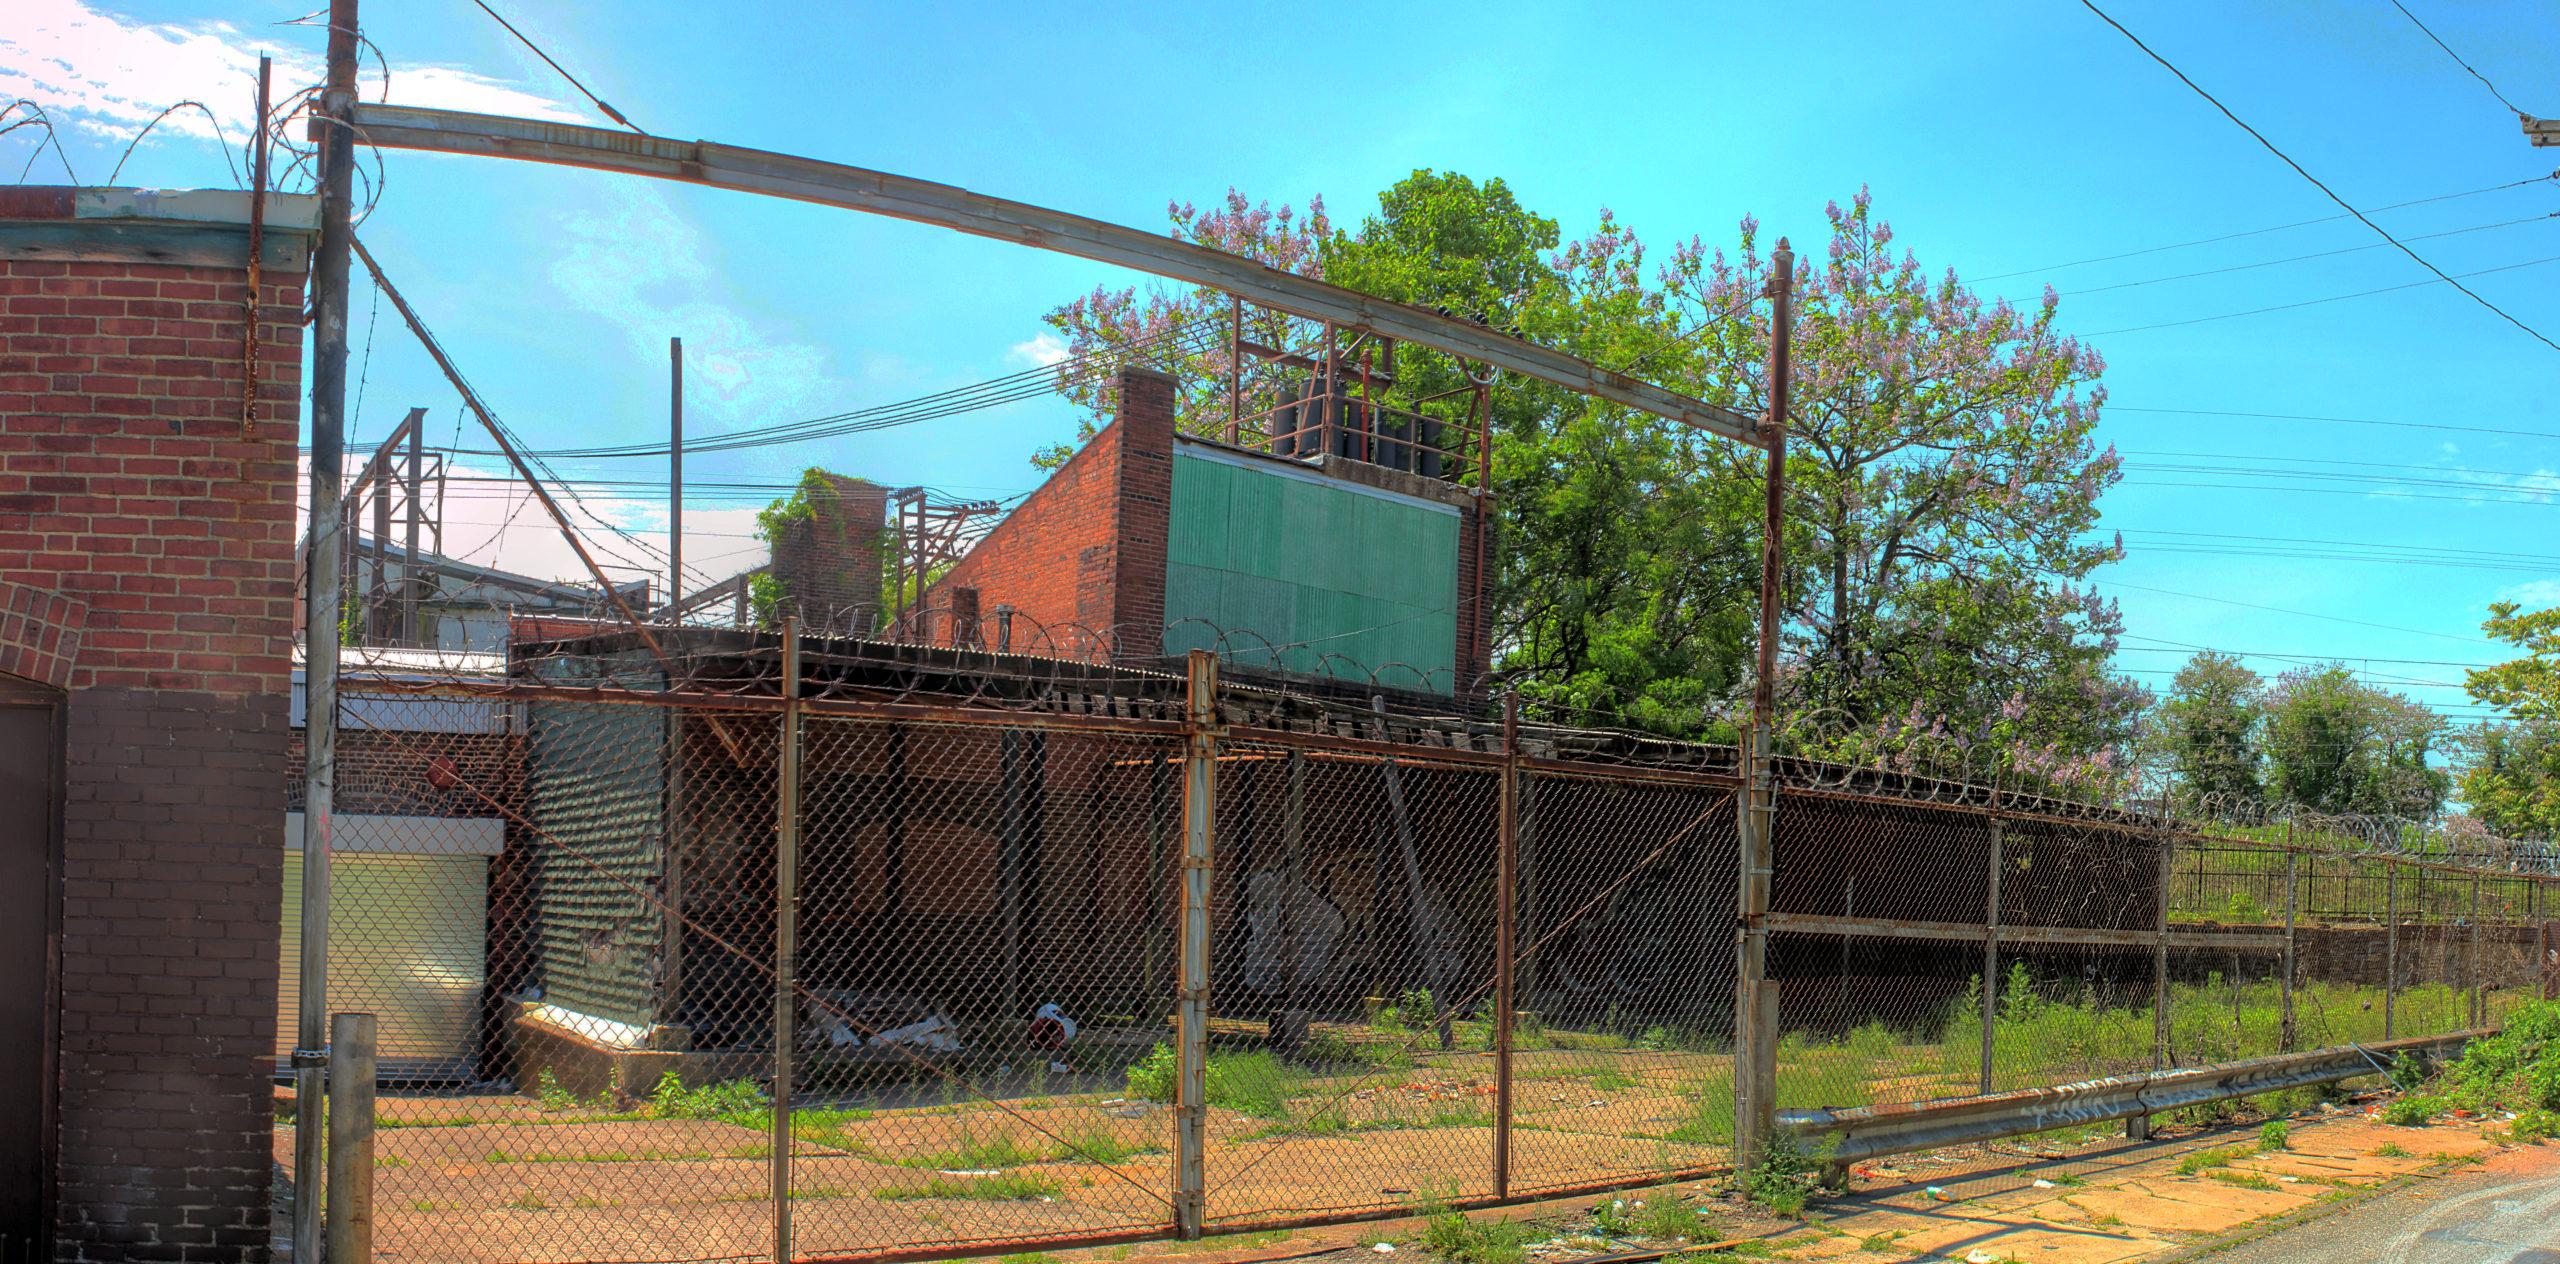 1725 Wishart St Philadelphia, PA Copyright 2019, Bob Bruhin. All rights reserved.